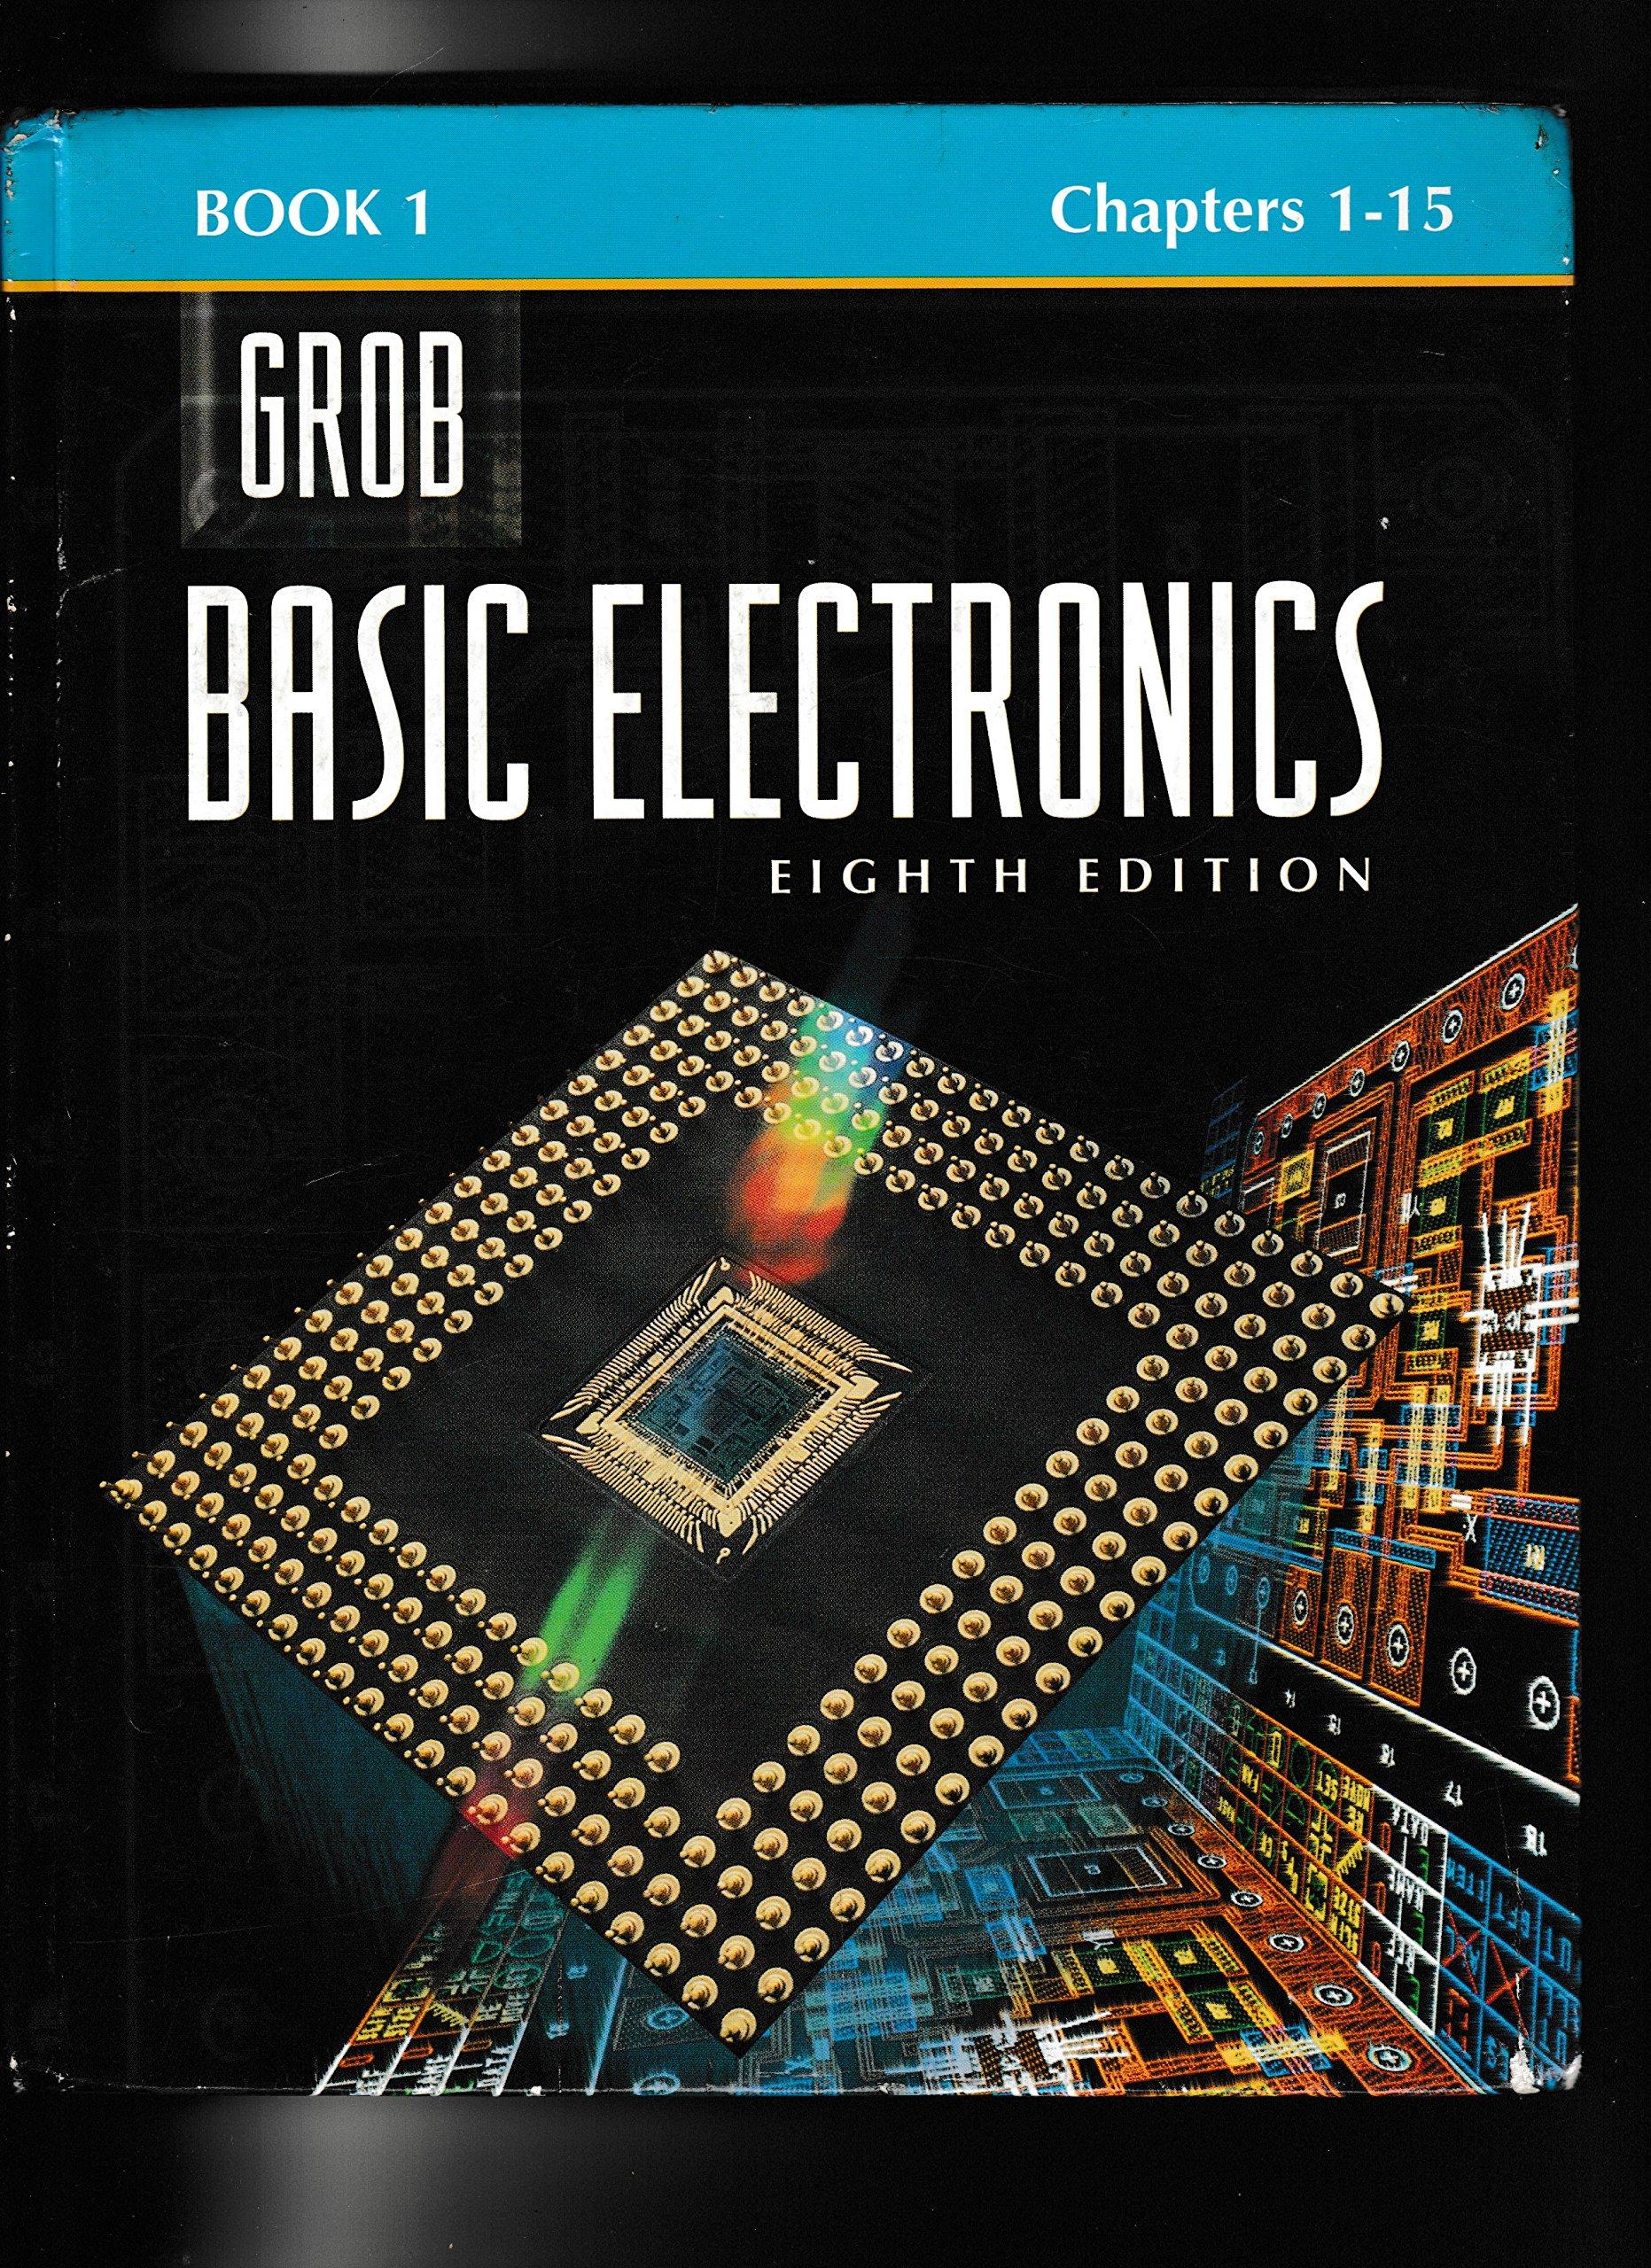 Basic Electronics Book 1 Chapters 1 15 Bernard Grob